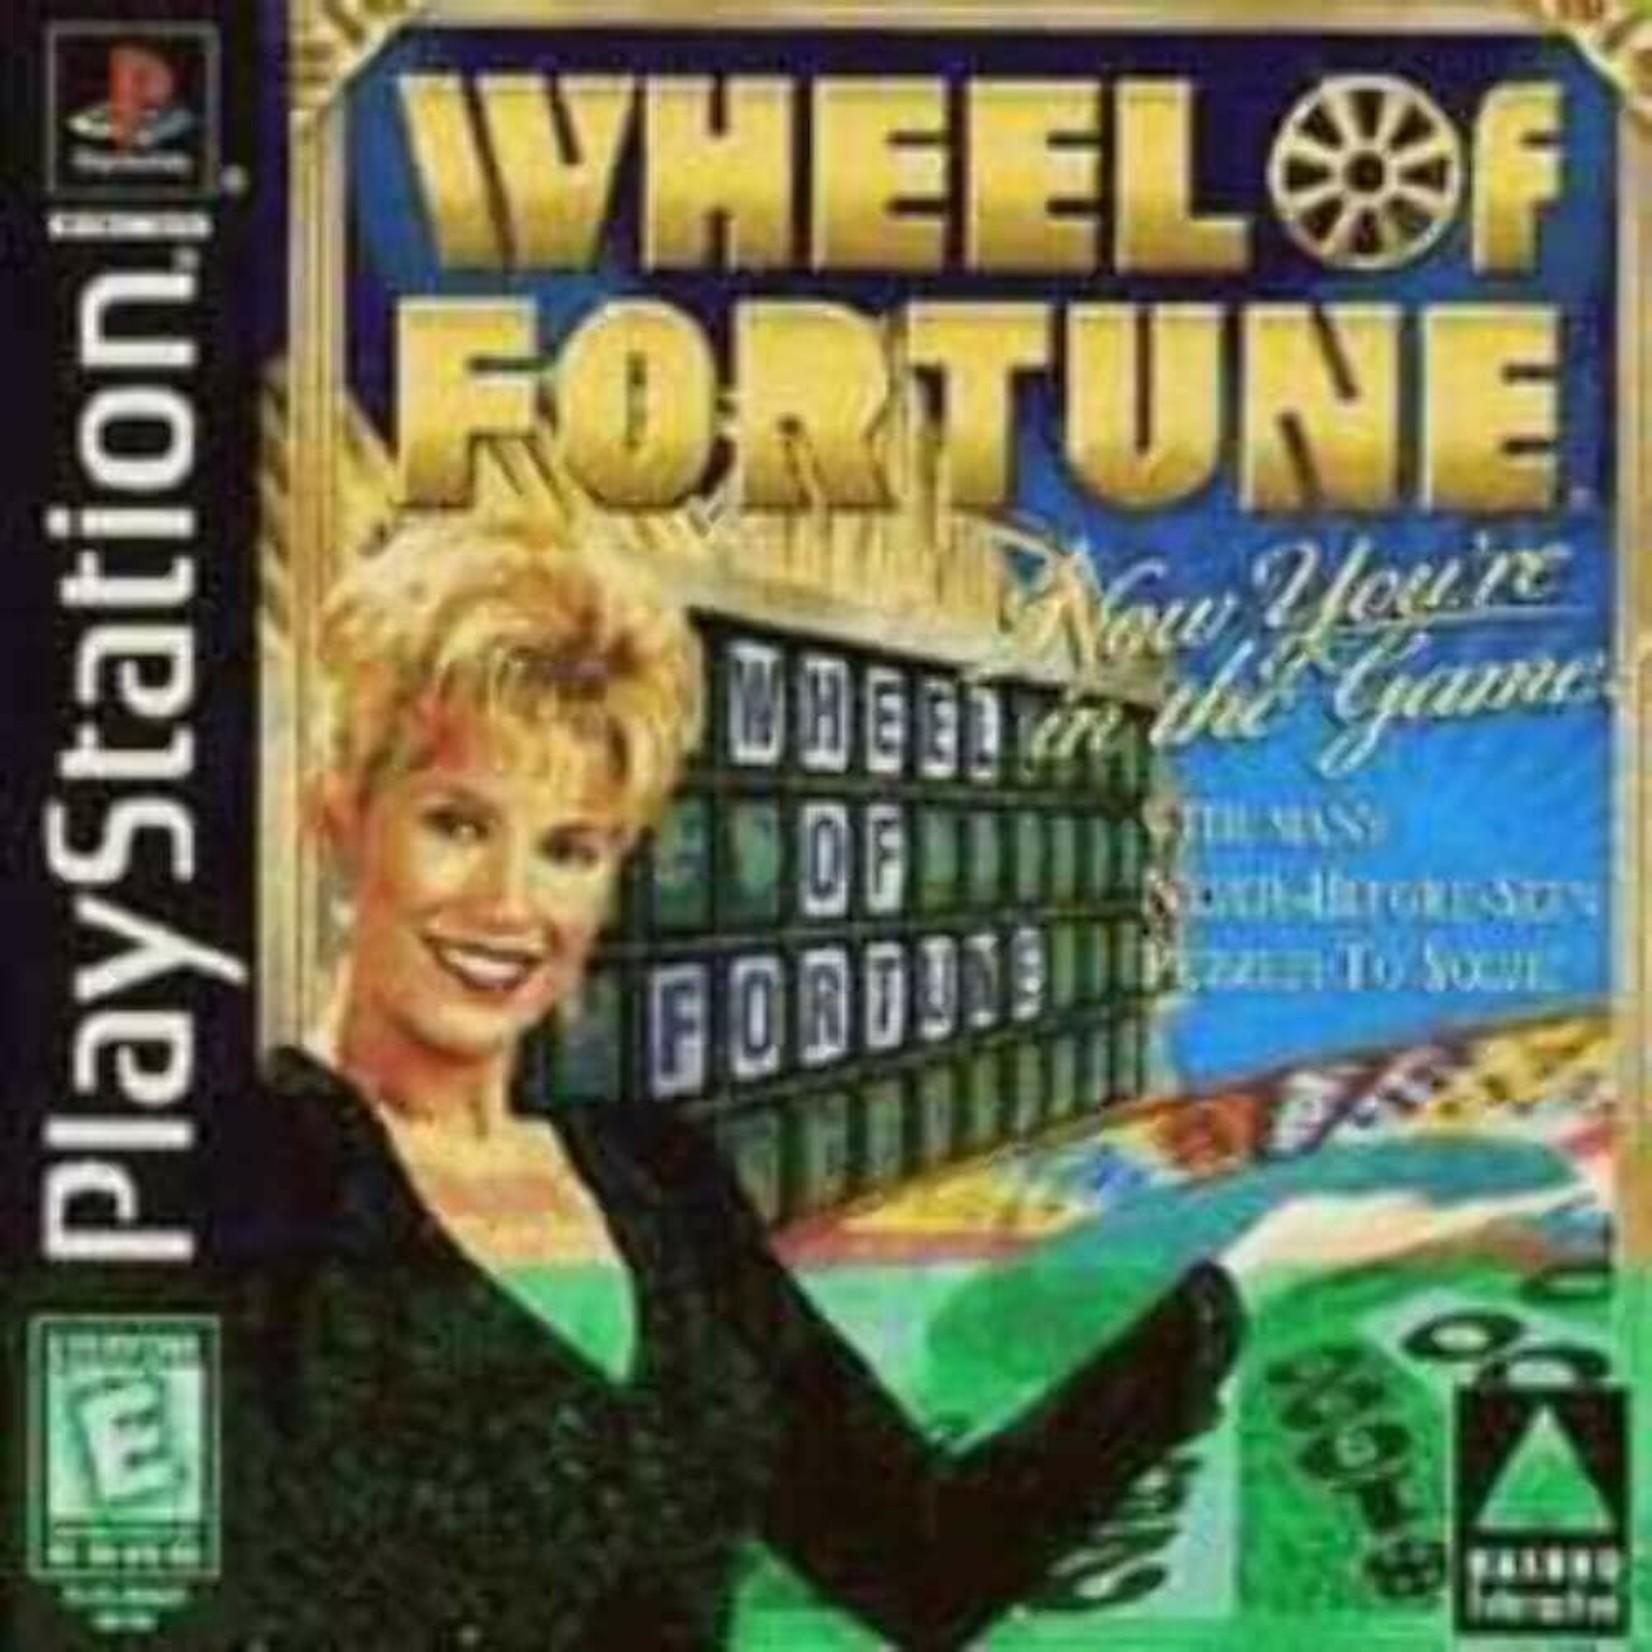 ps1u-Wheel Of Fortune